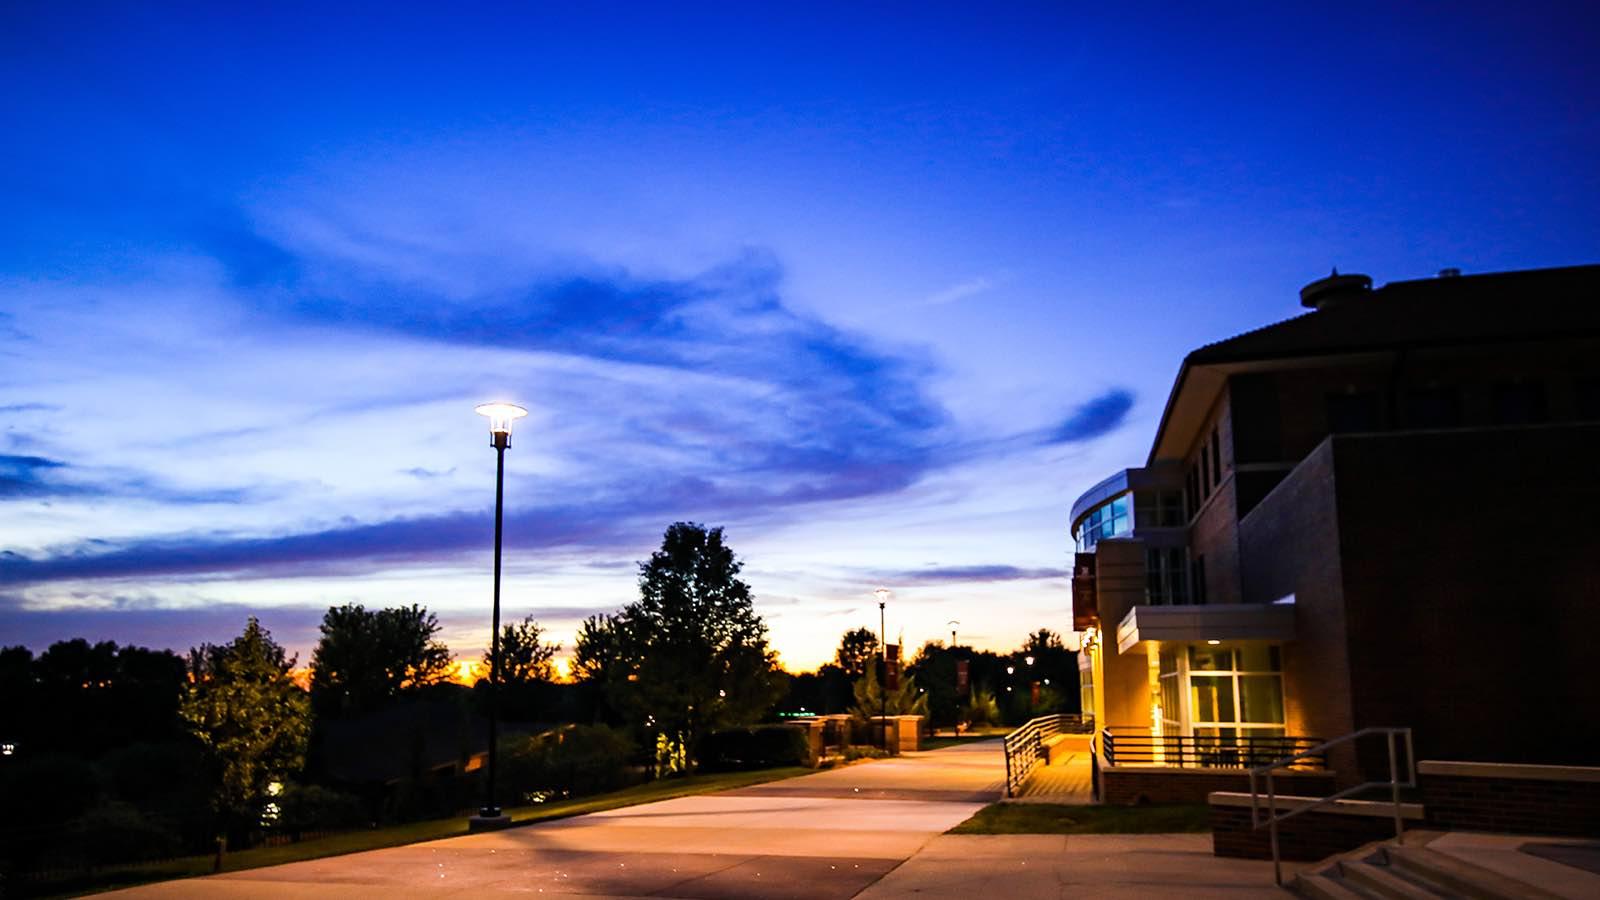 Morningside campus at night